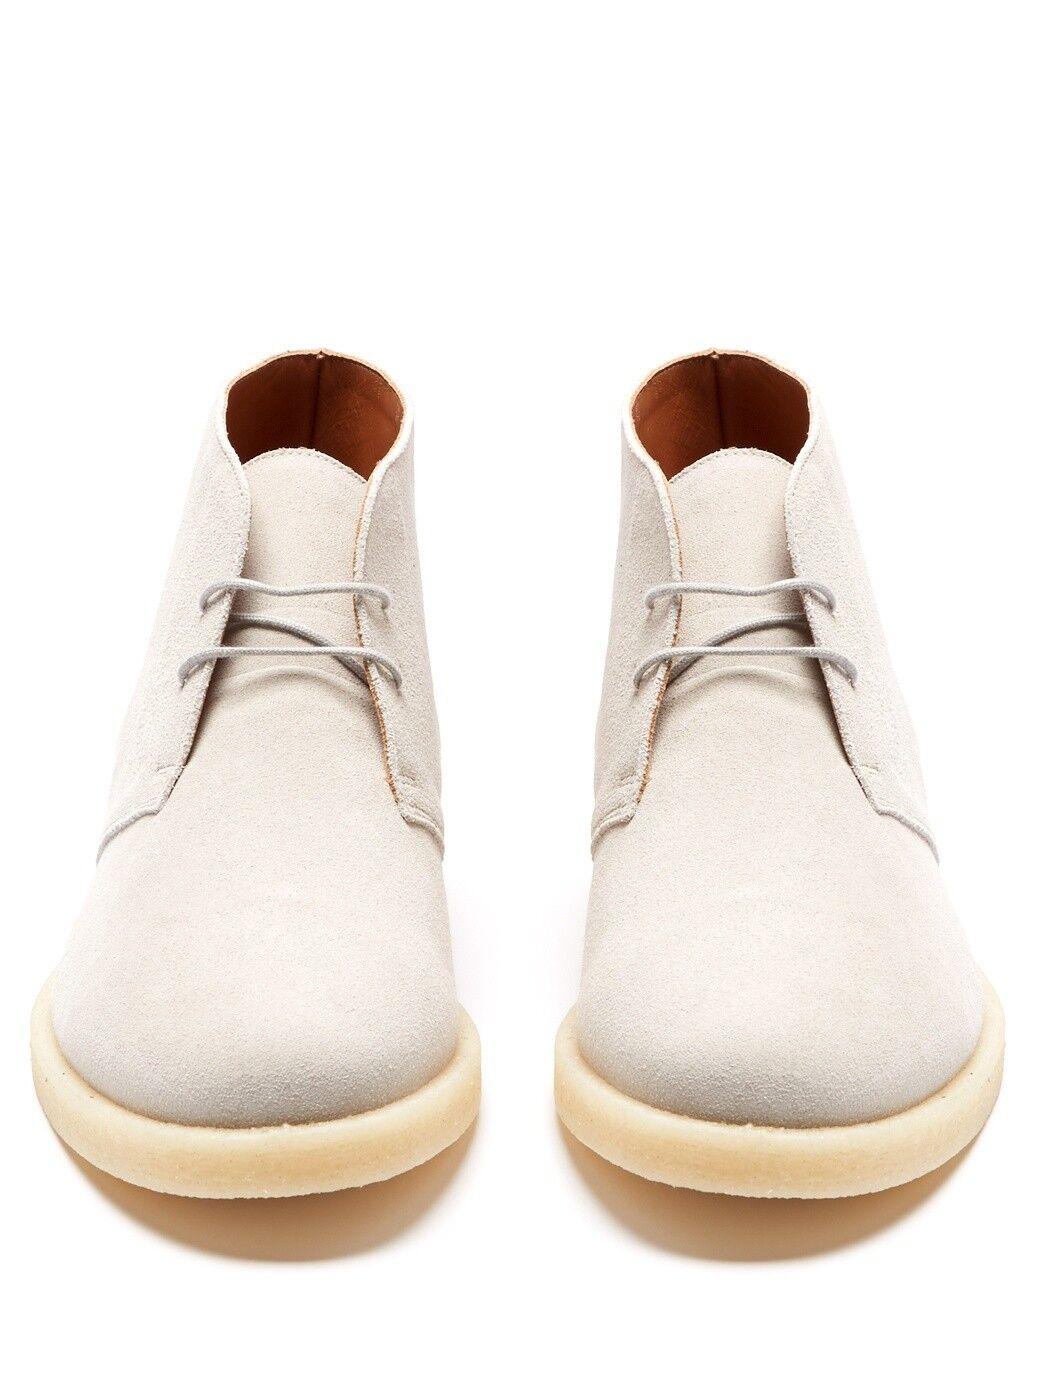 Brand nouveau In Box Common Projects Suede Desert bottes Crepe Sole EU42 UK8